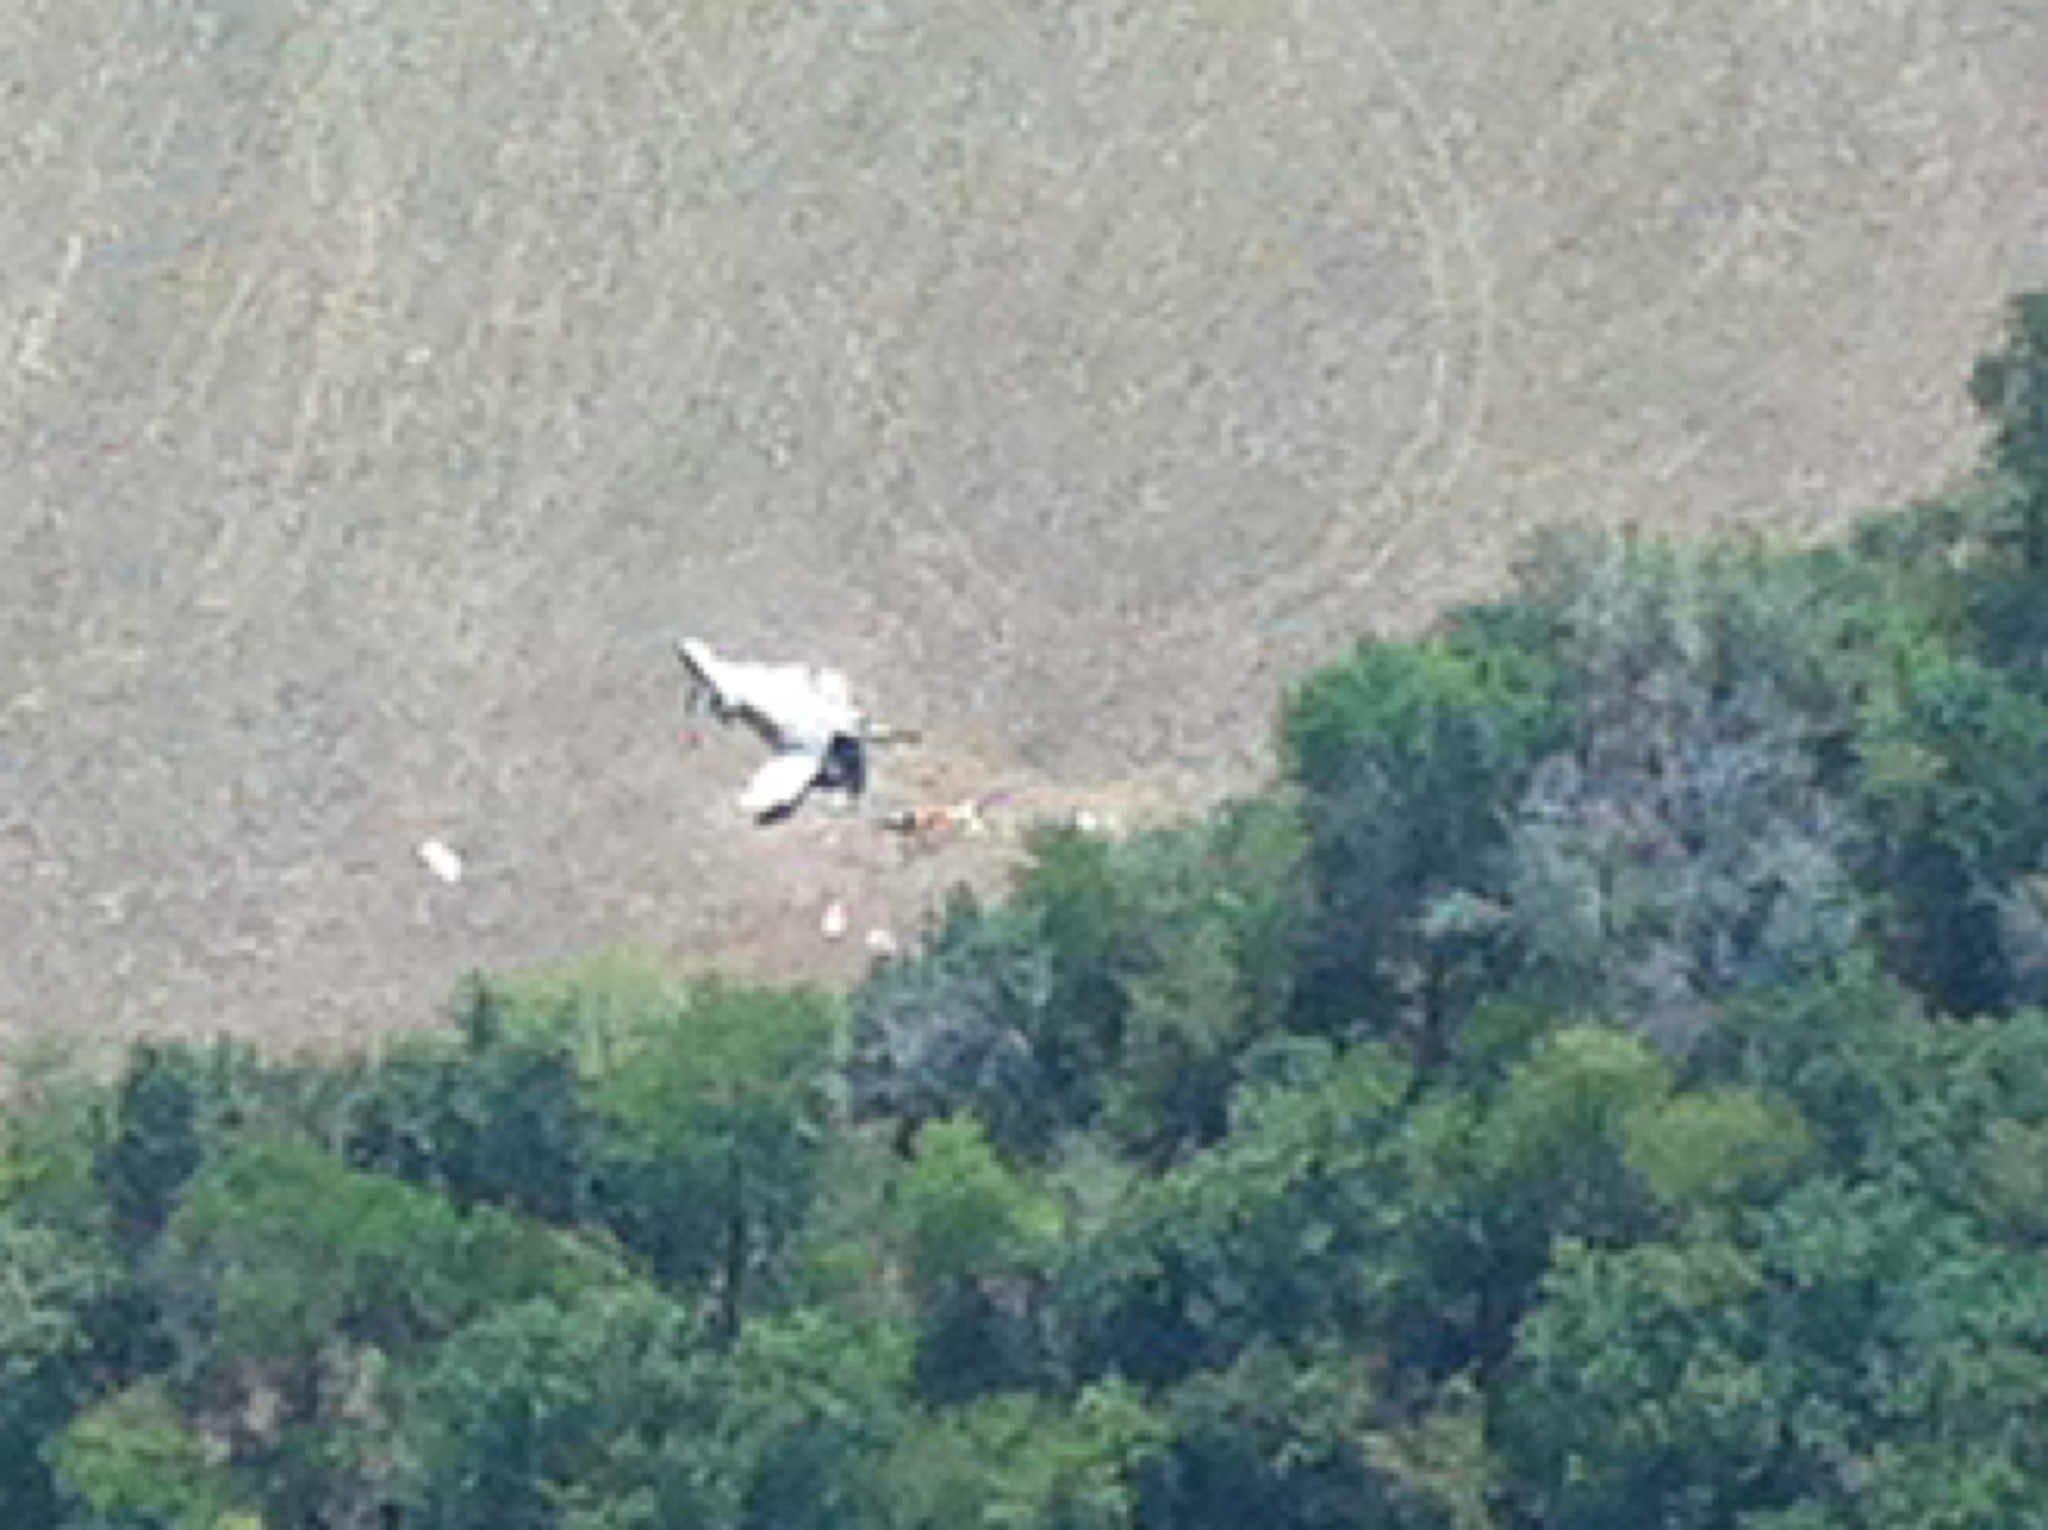 Aerial photo at scene of Lewis Co. plane crash (Photo/Joe McFarland, WGEM News)